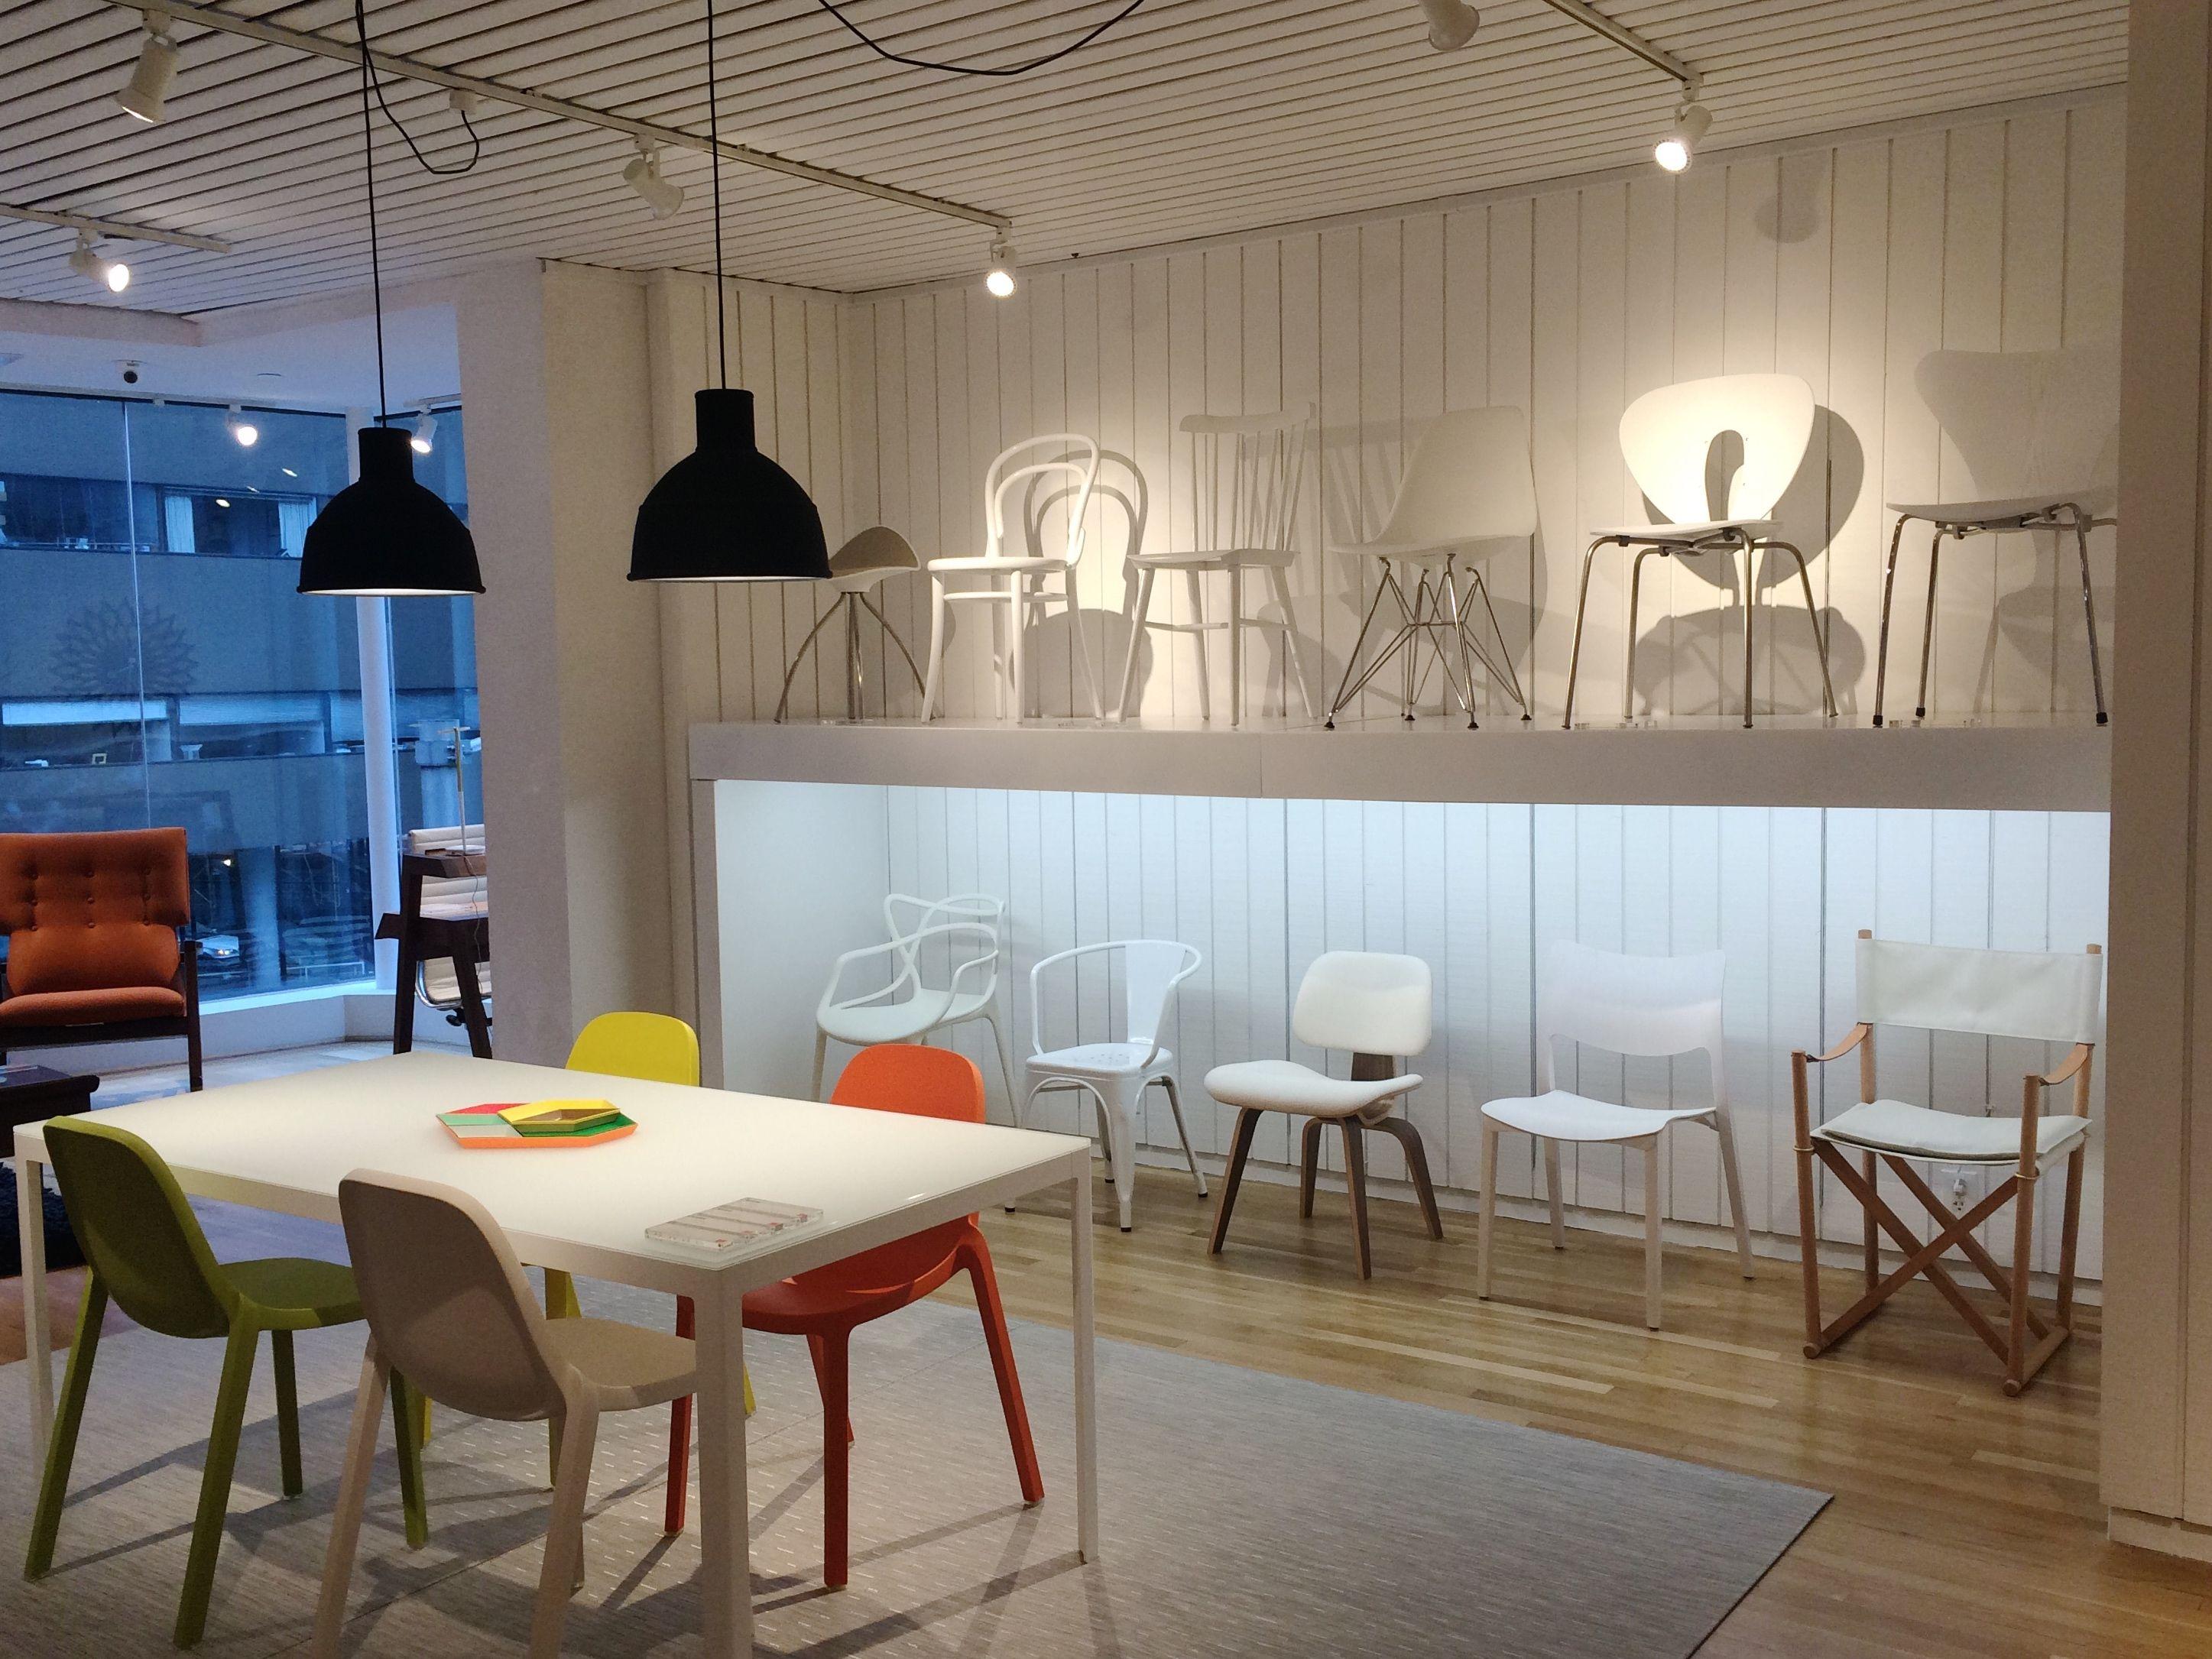 creative ways to display chairs - Google Search | display ...